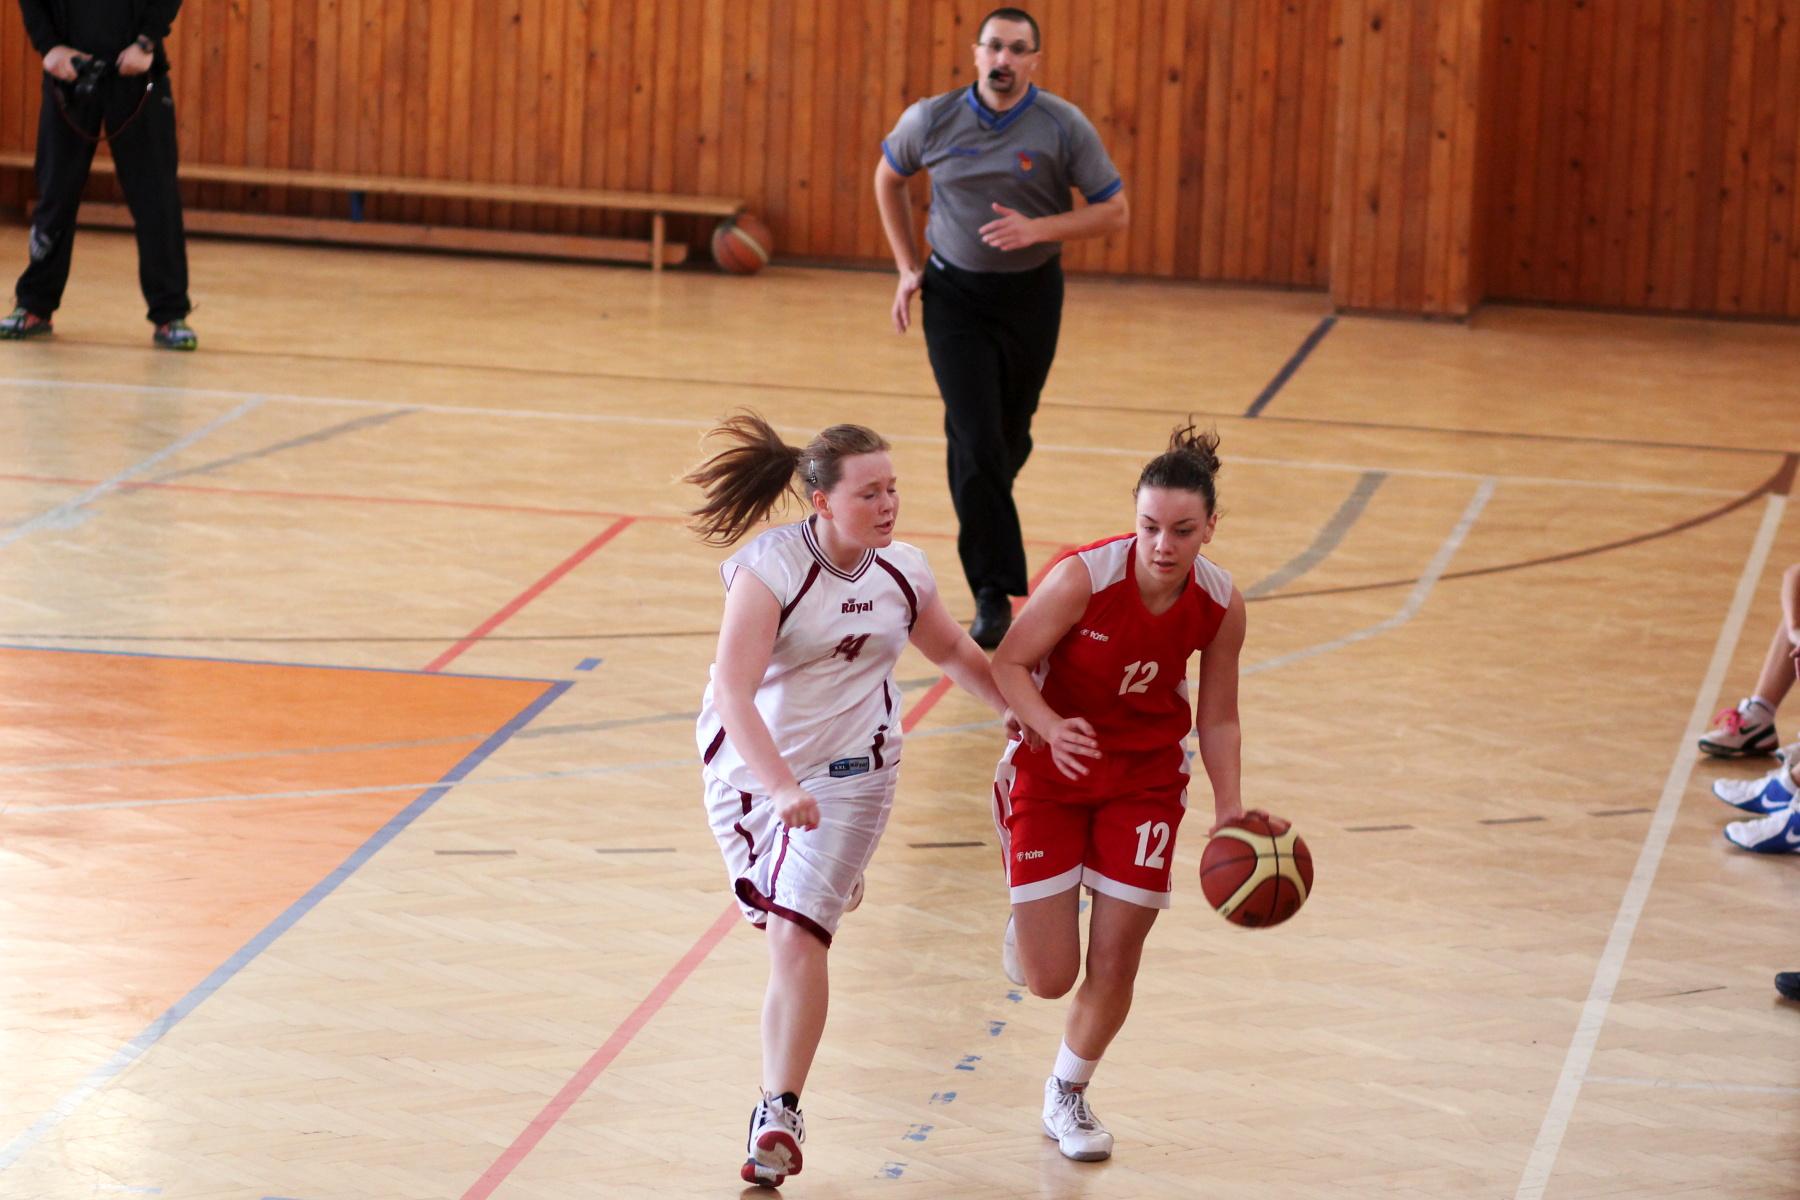 zvolen-bystrica-ziacky-basketbal-13